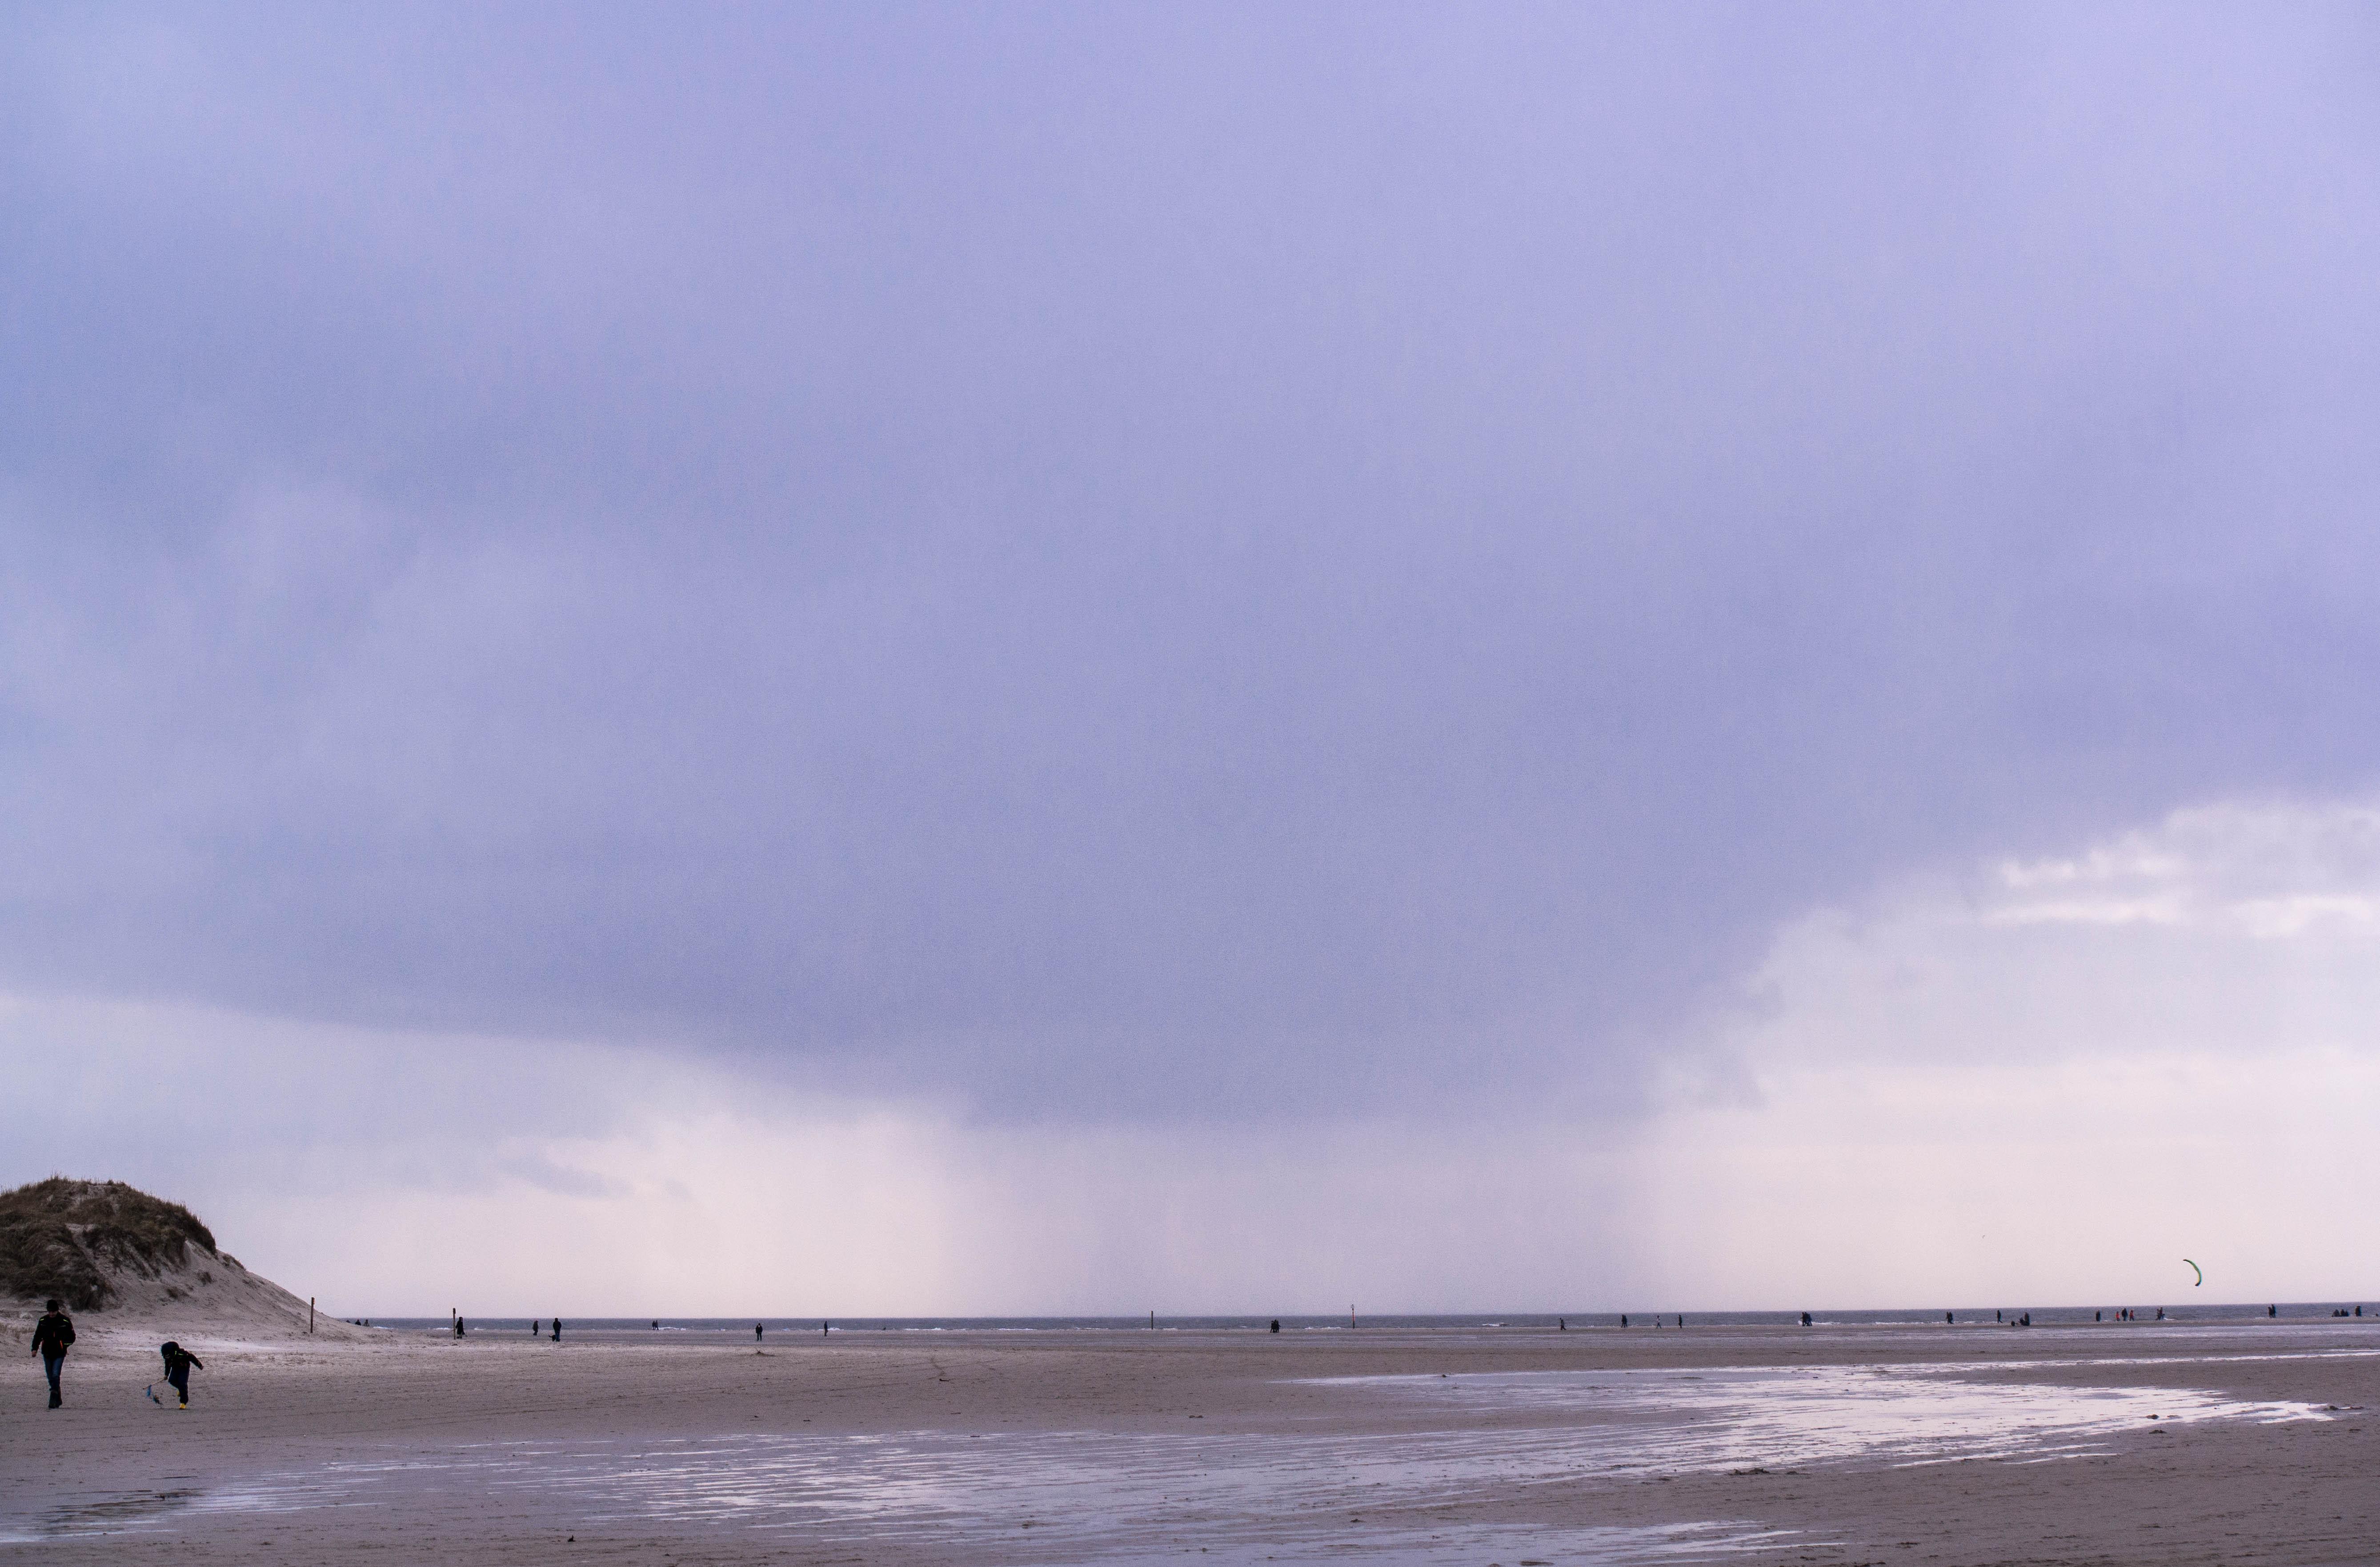 Regenfront über den Meer von Sankt Peter-Ording